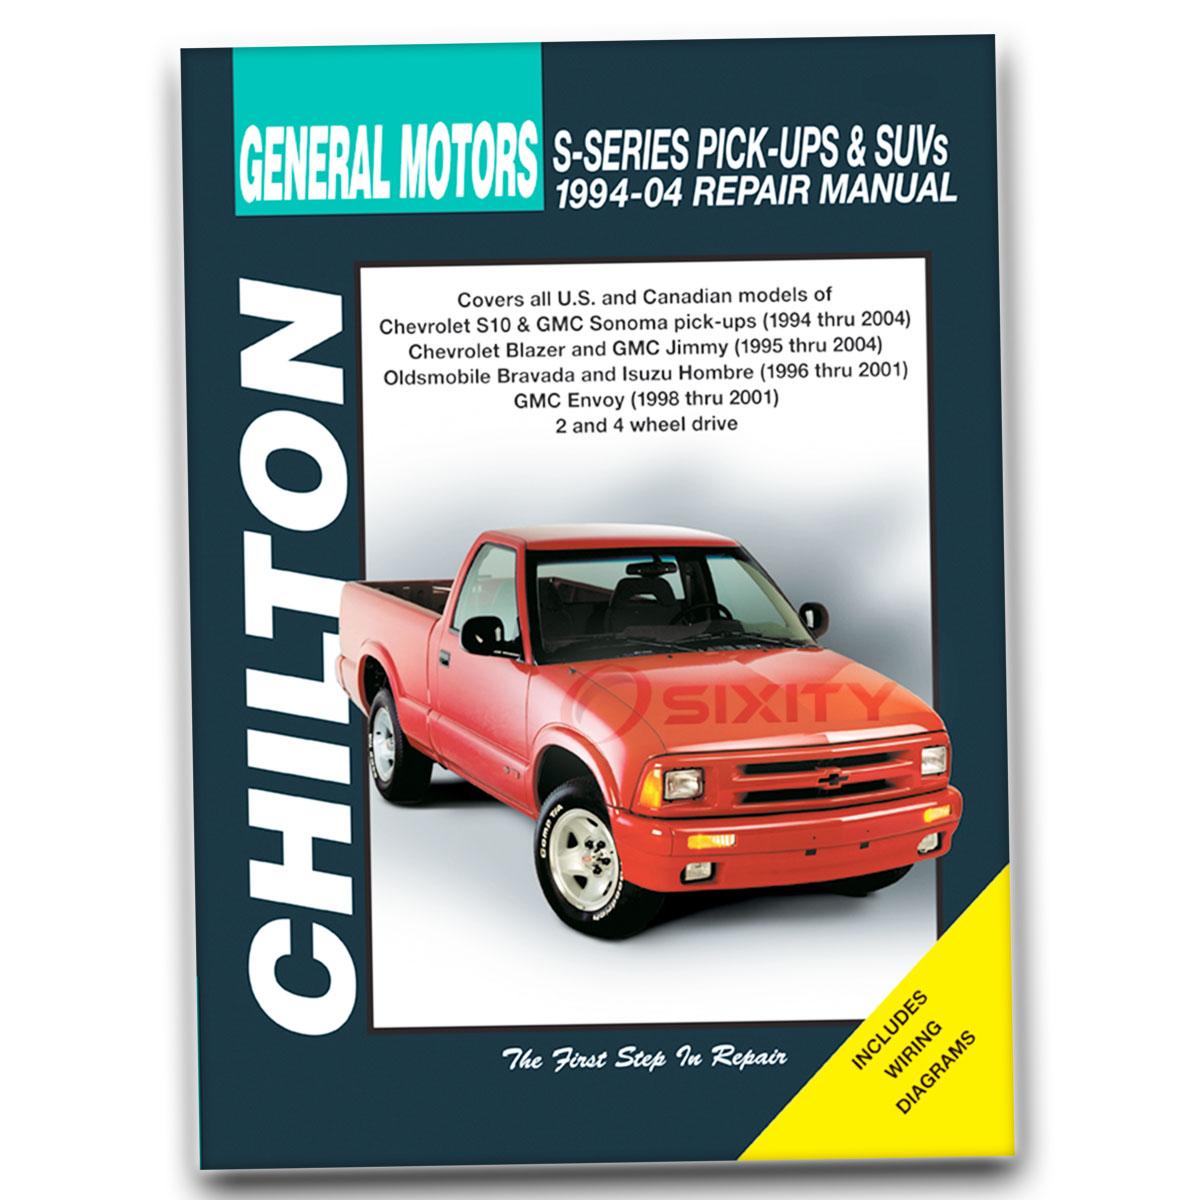 Chevy Blazer Chilton Repair Manual Base Trailblazer Xtreme border=